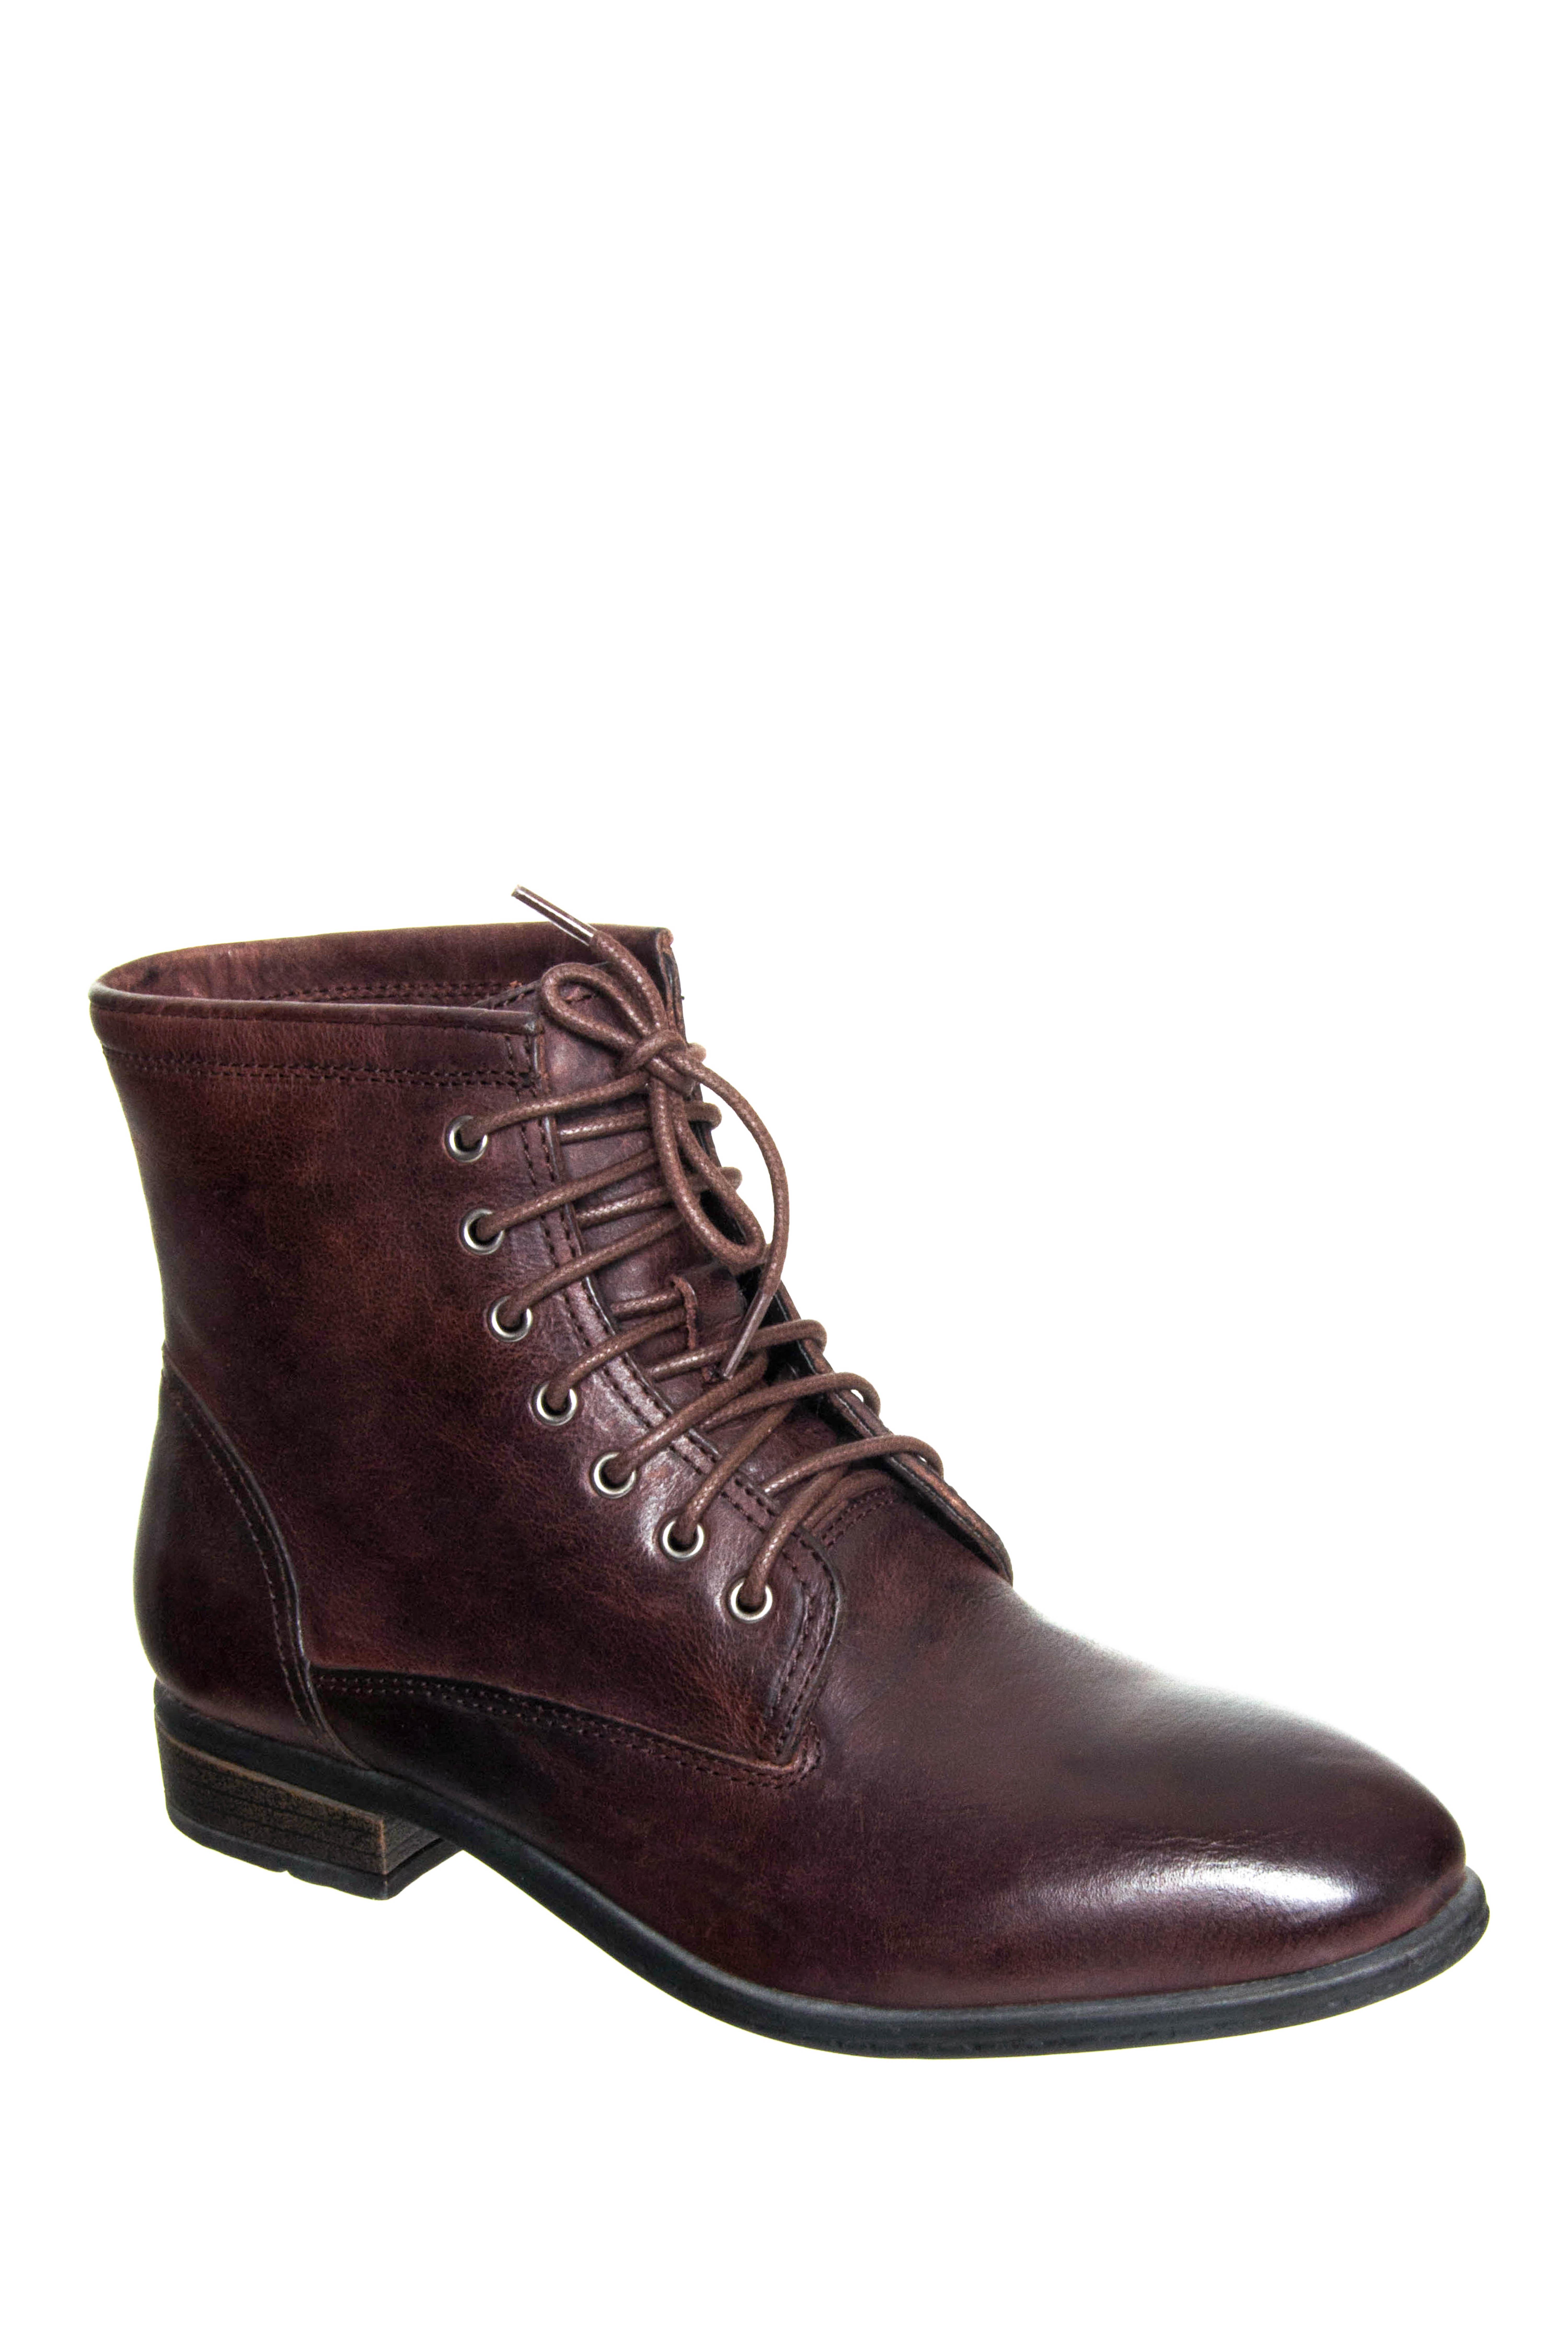 Eastland Juliana Low Heel Boots - Dark Walnut